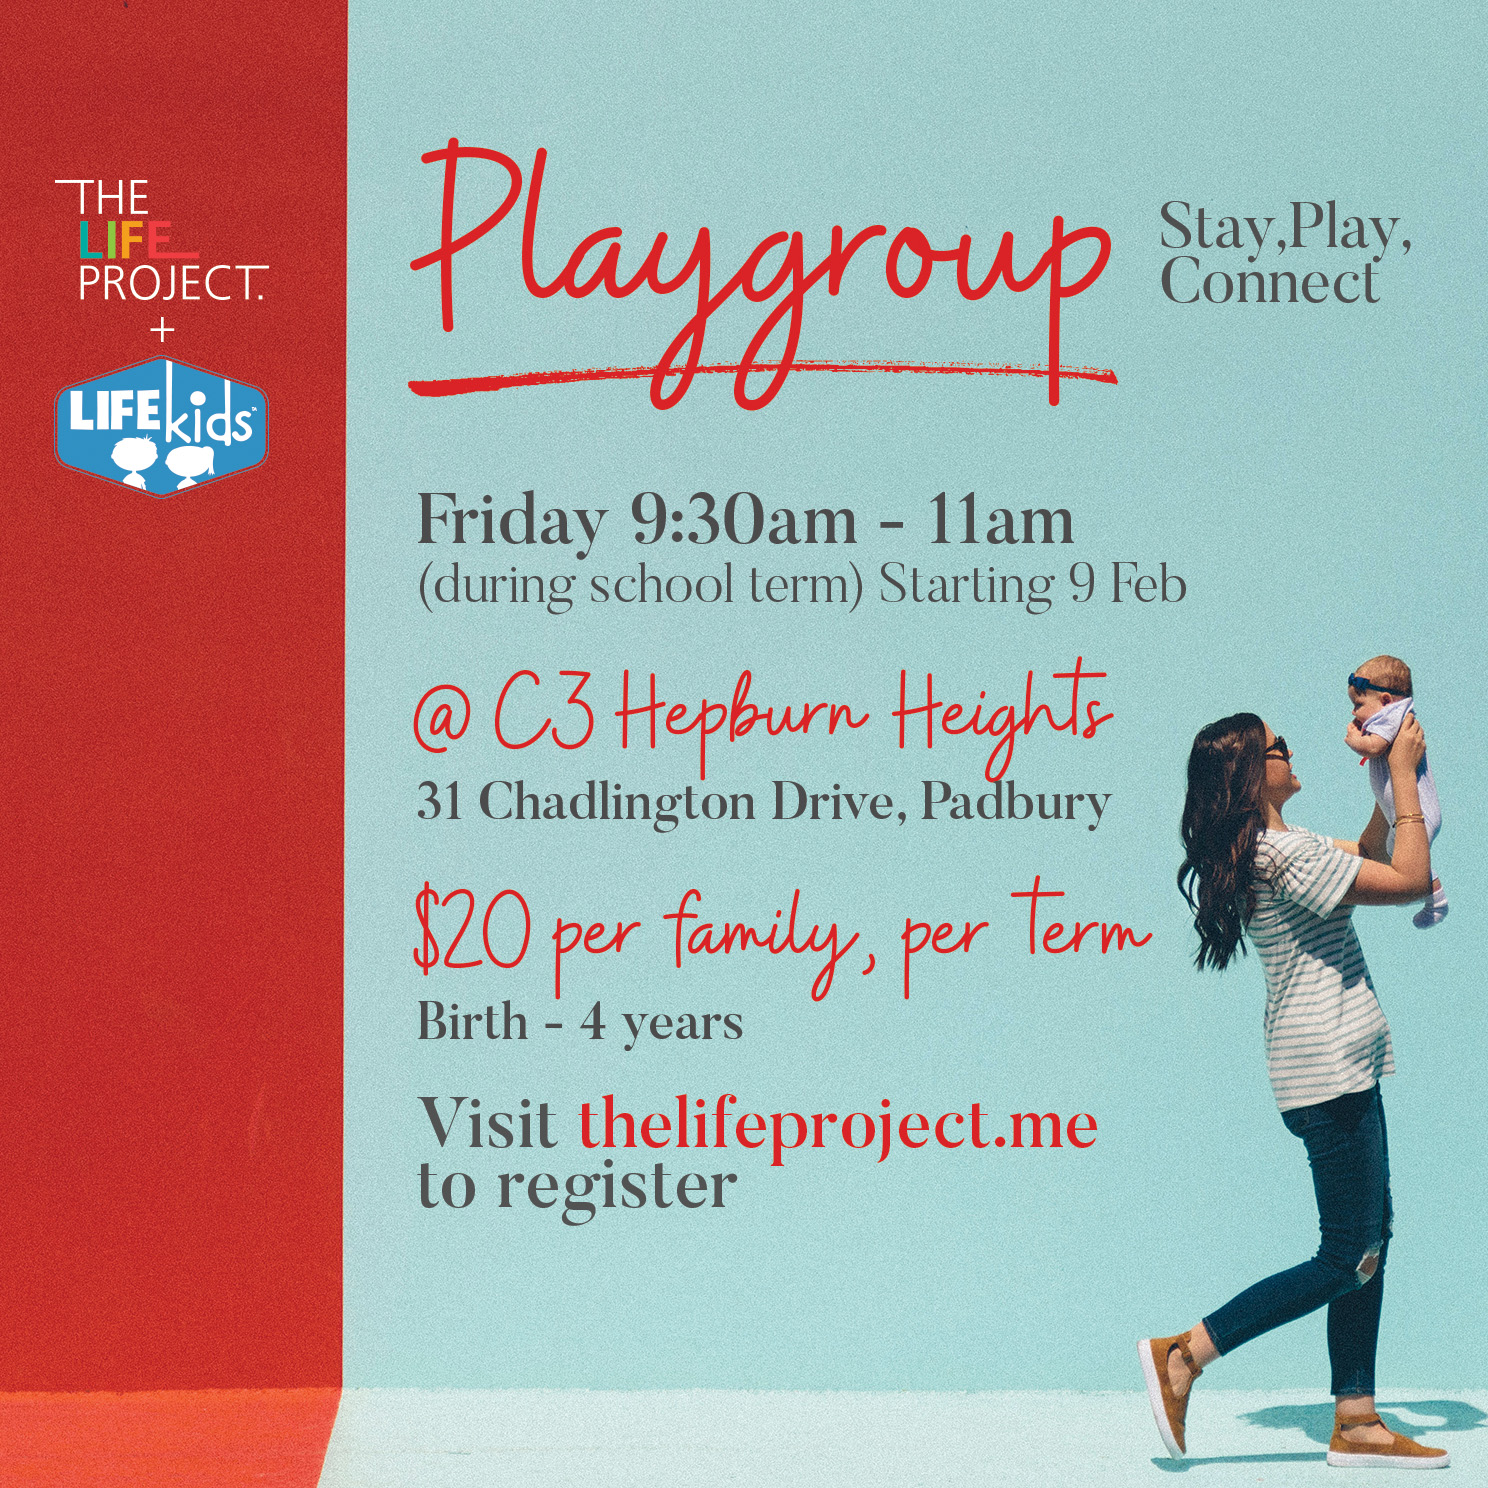 Playgroup-WEB.jpg